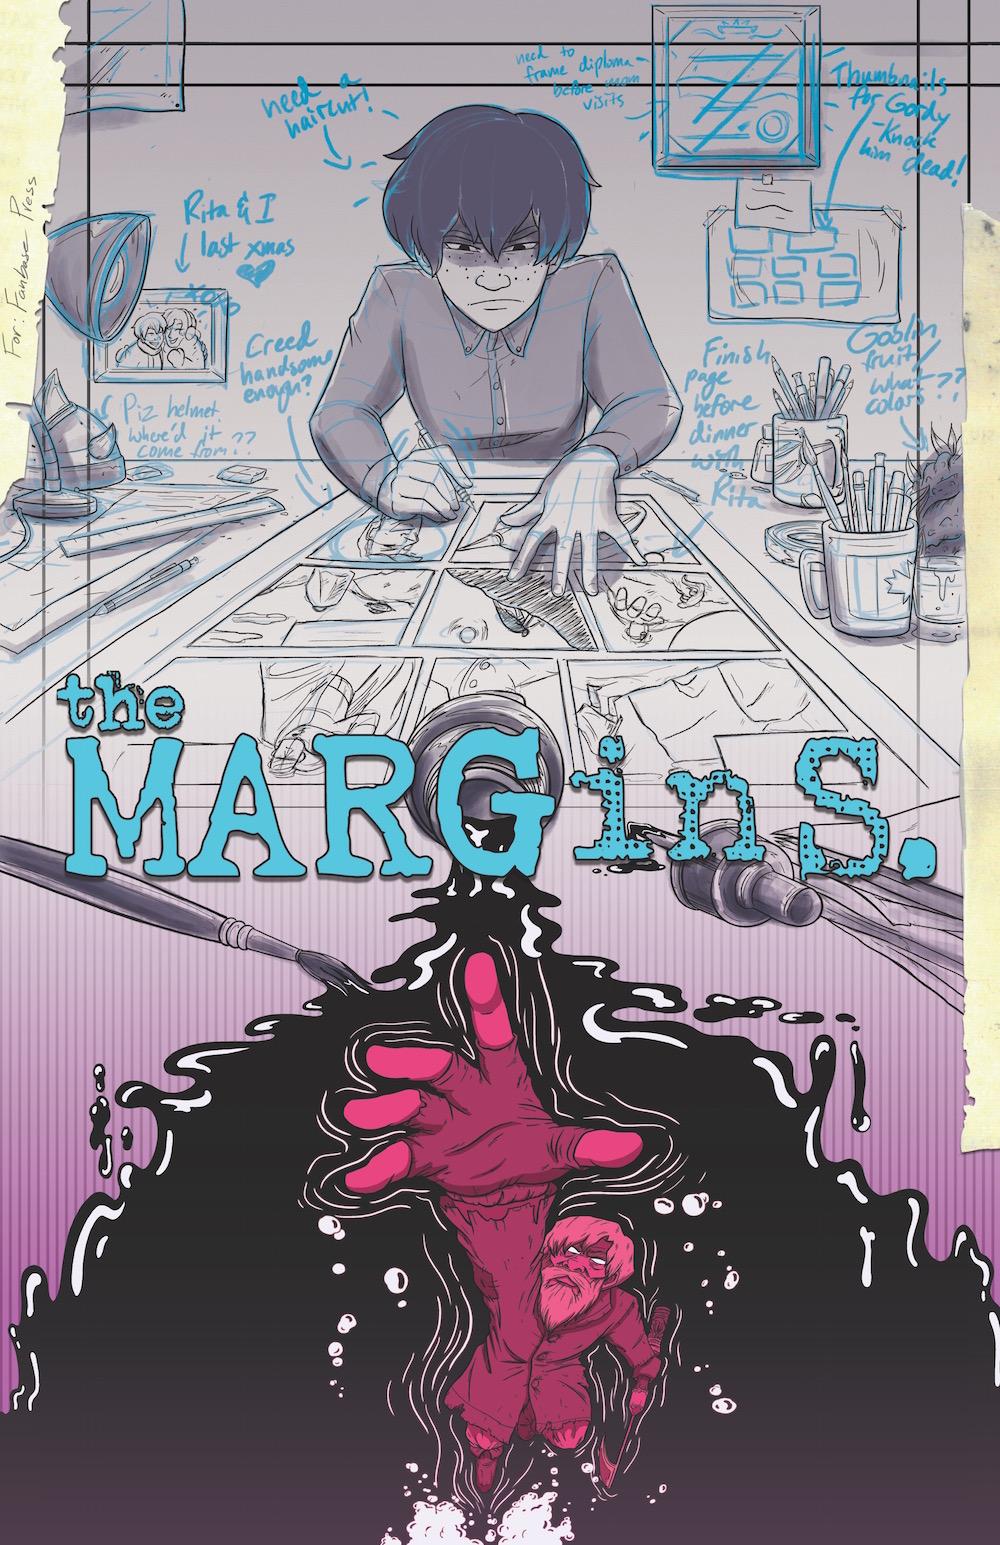 The Margins - Cover Image.jpg